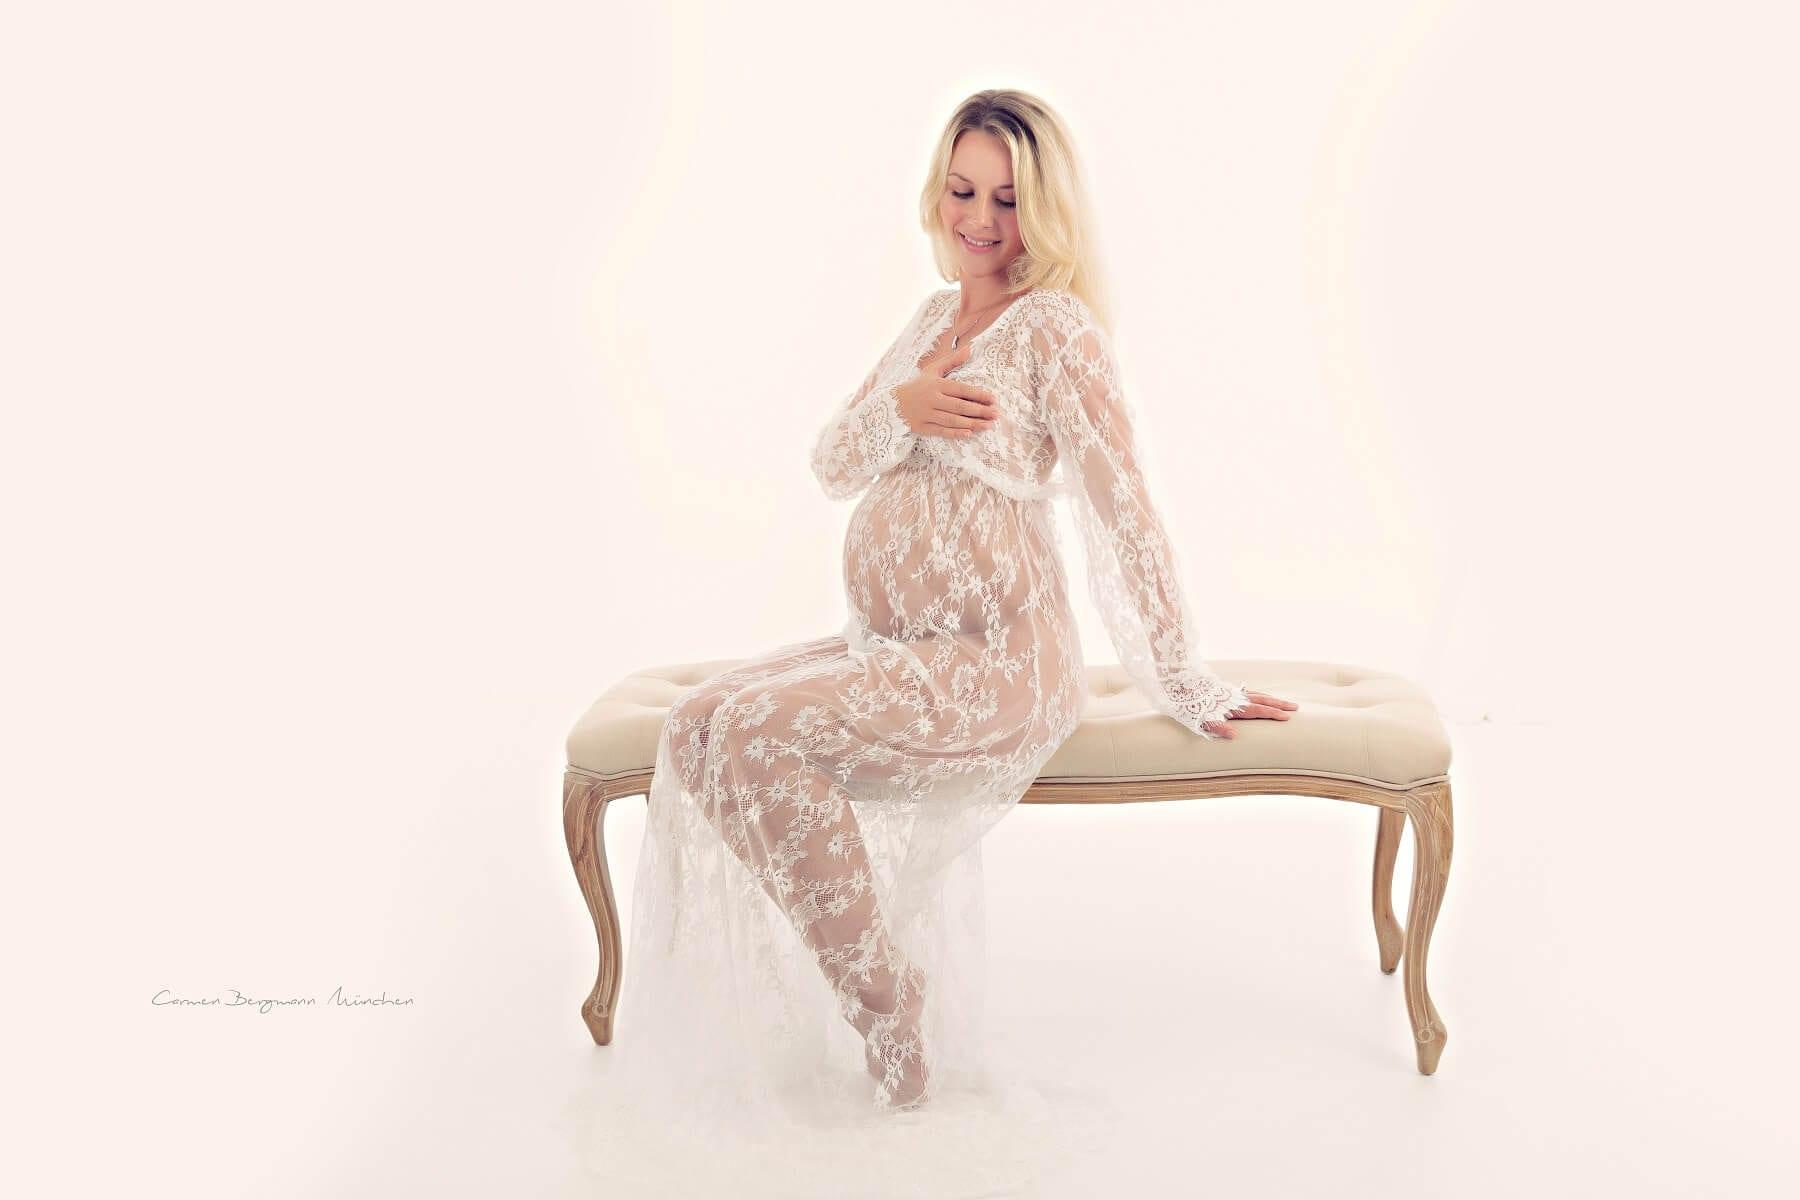 Fotografin Carmen Bergmann Babybauch Shooting blonde schwangere Frau in Fotostudio auf Bank